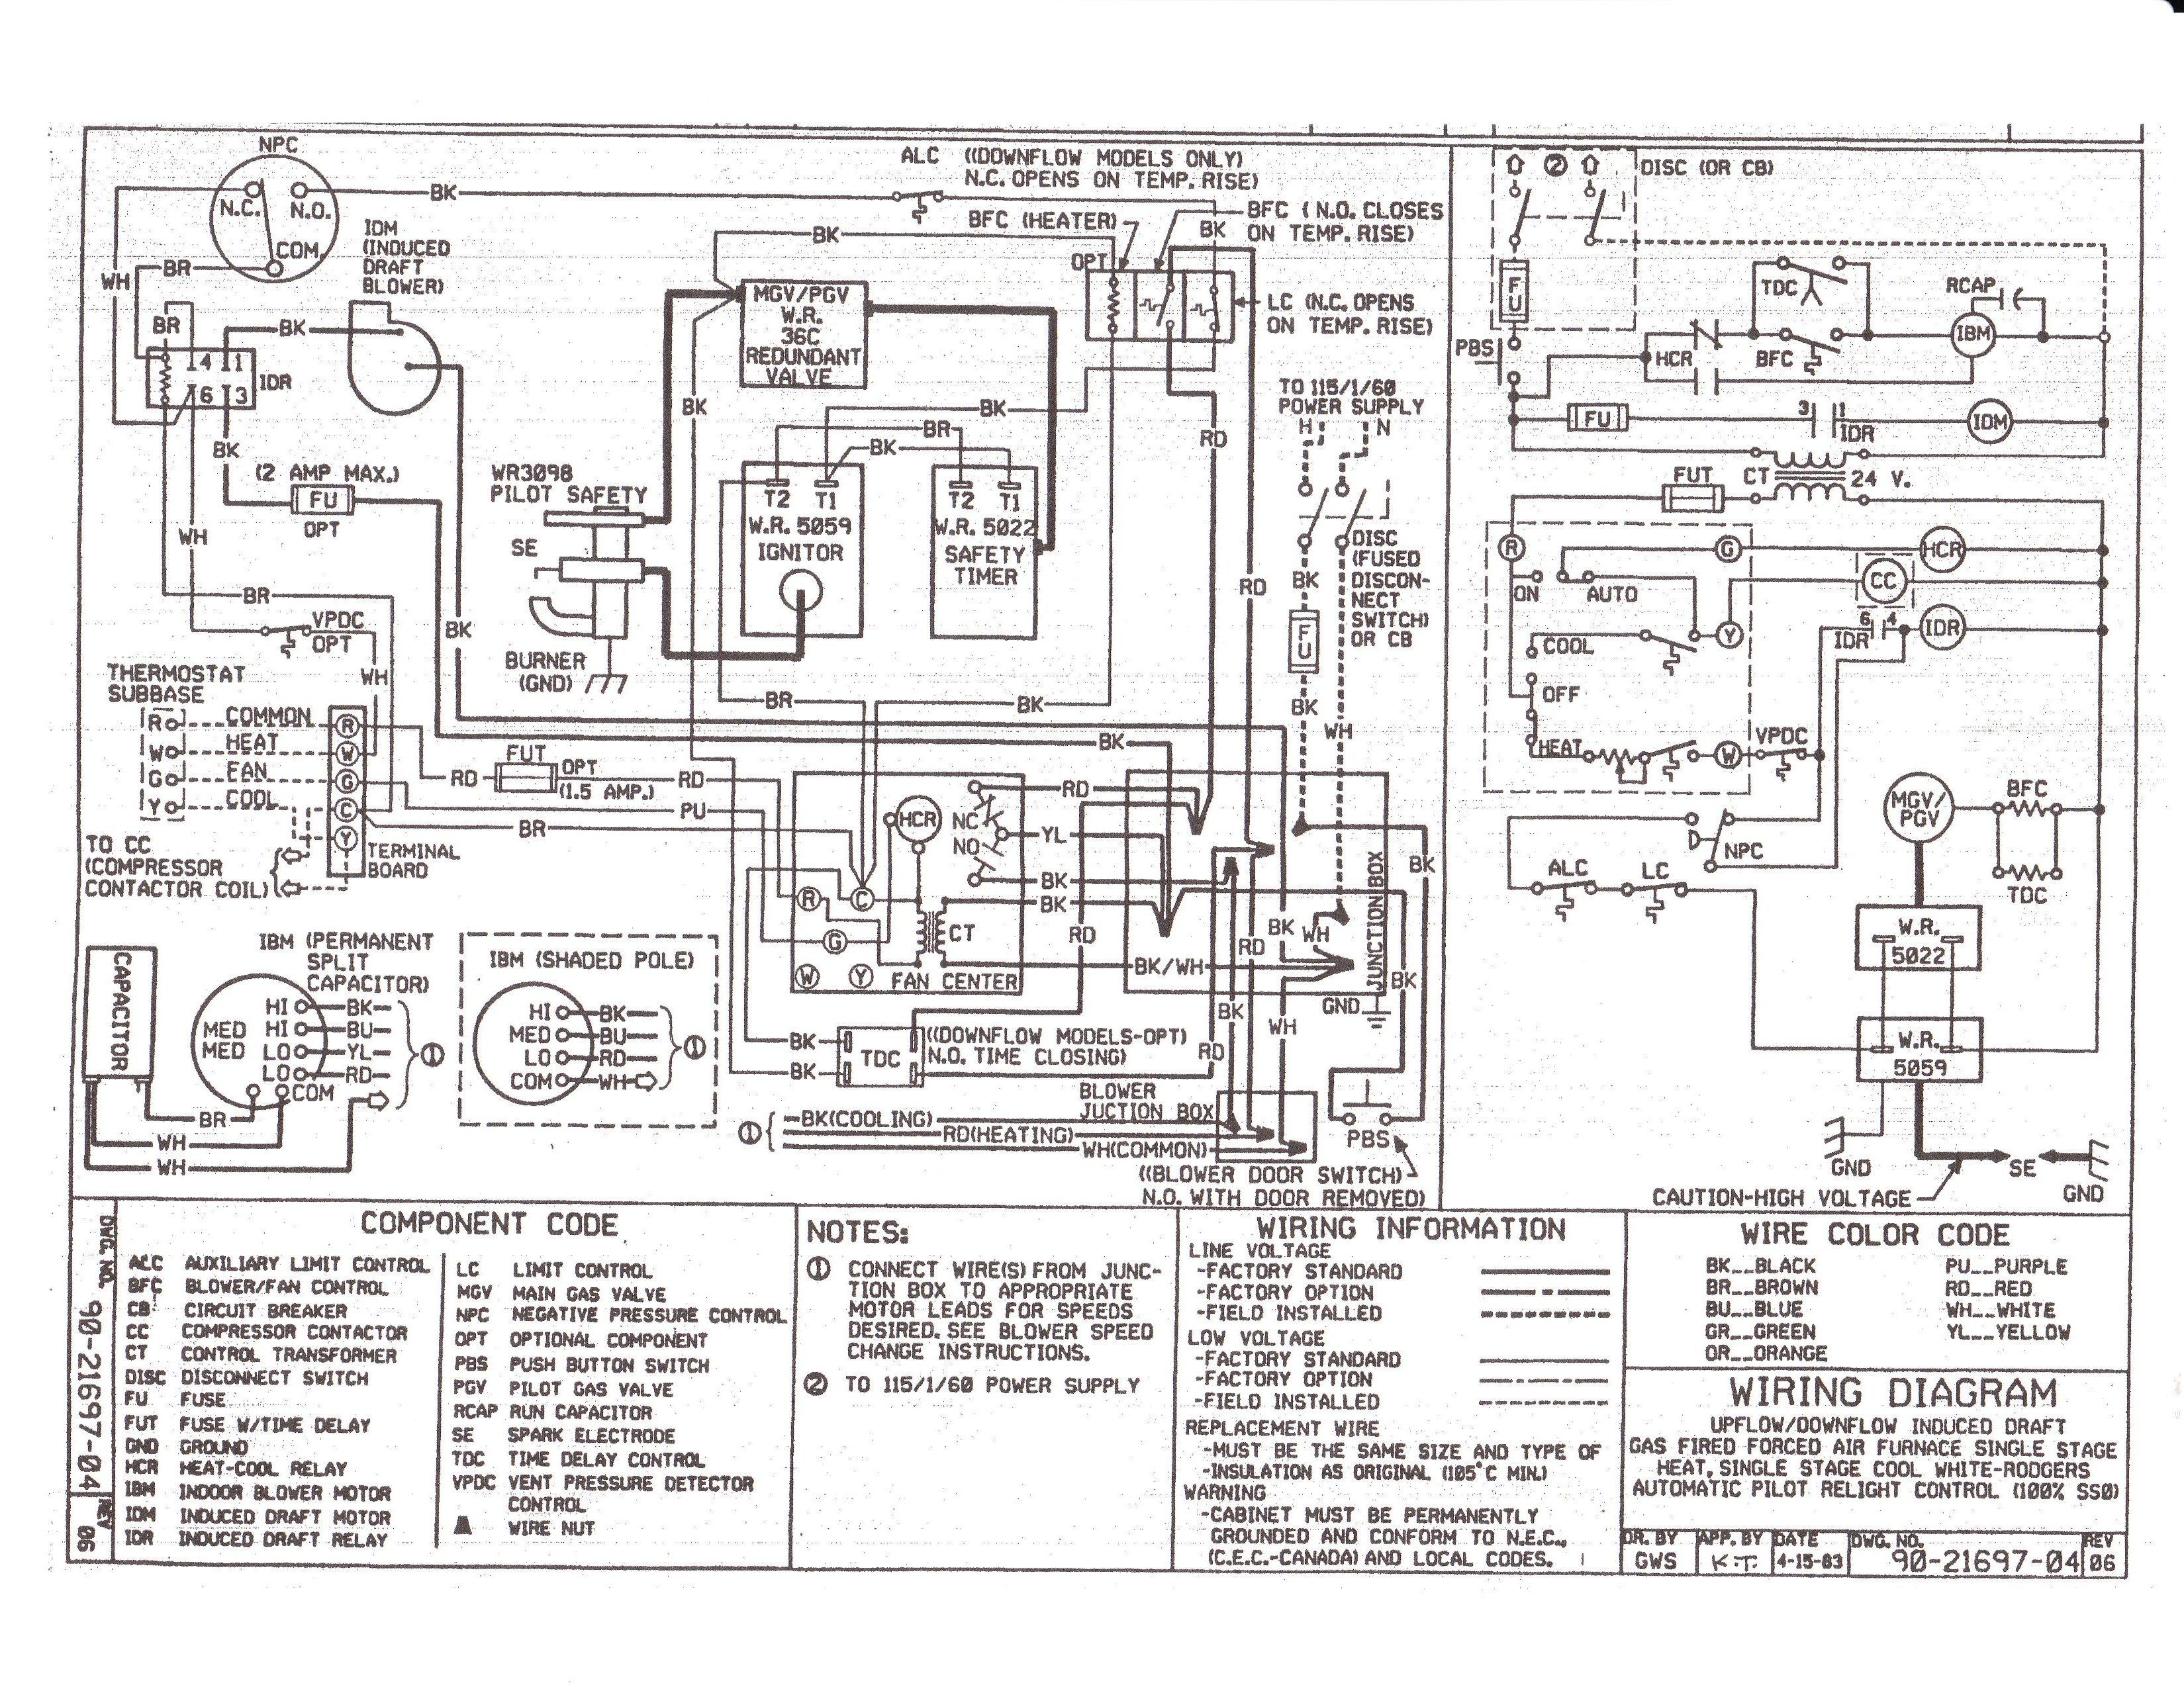 DIAGRAM] Gas Pack Furnace Wiring Diagram FULL Version HD Quality Wiring  Diagram - FORDWIREDIAGRAM.VIRTUAL-EDGE.IT